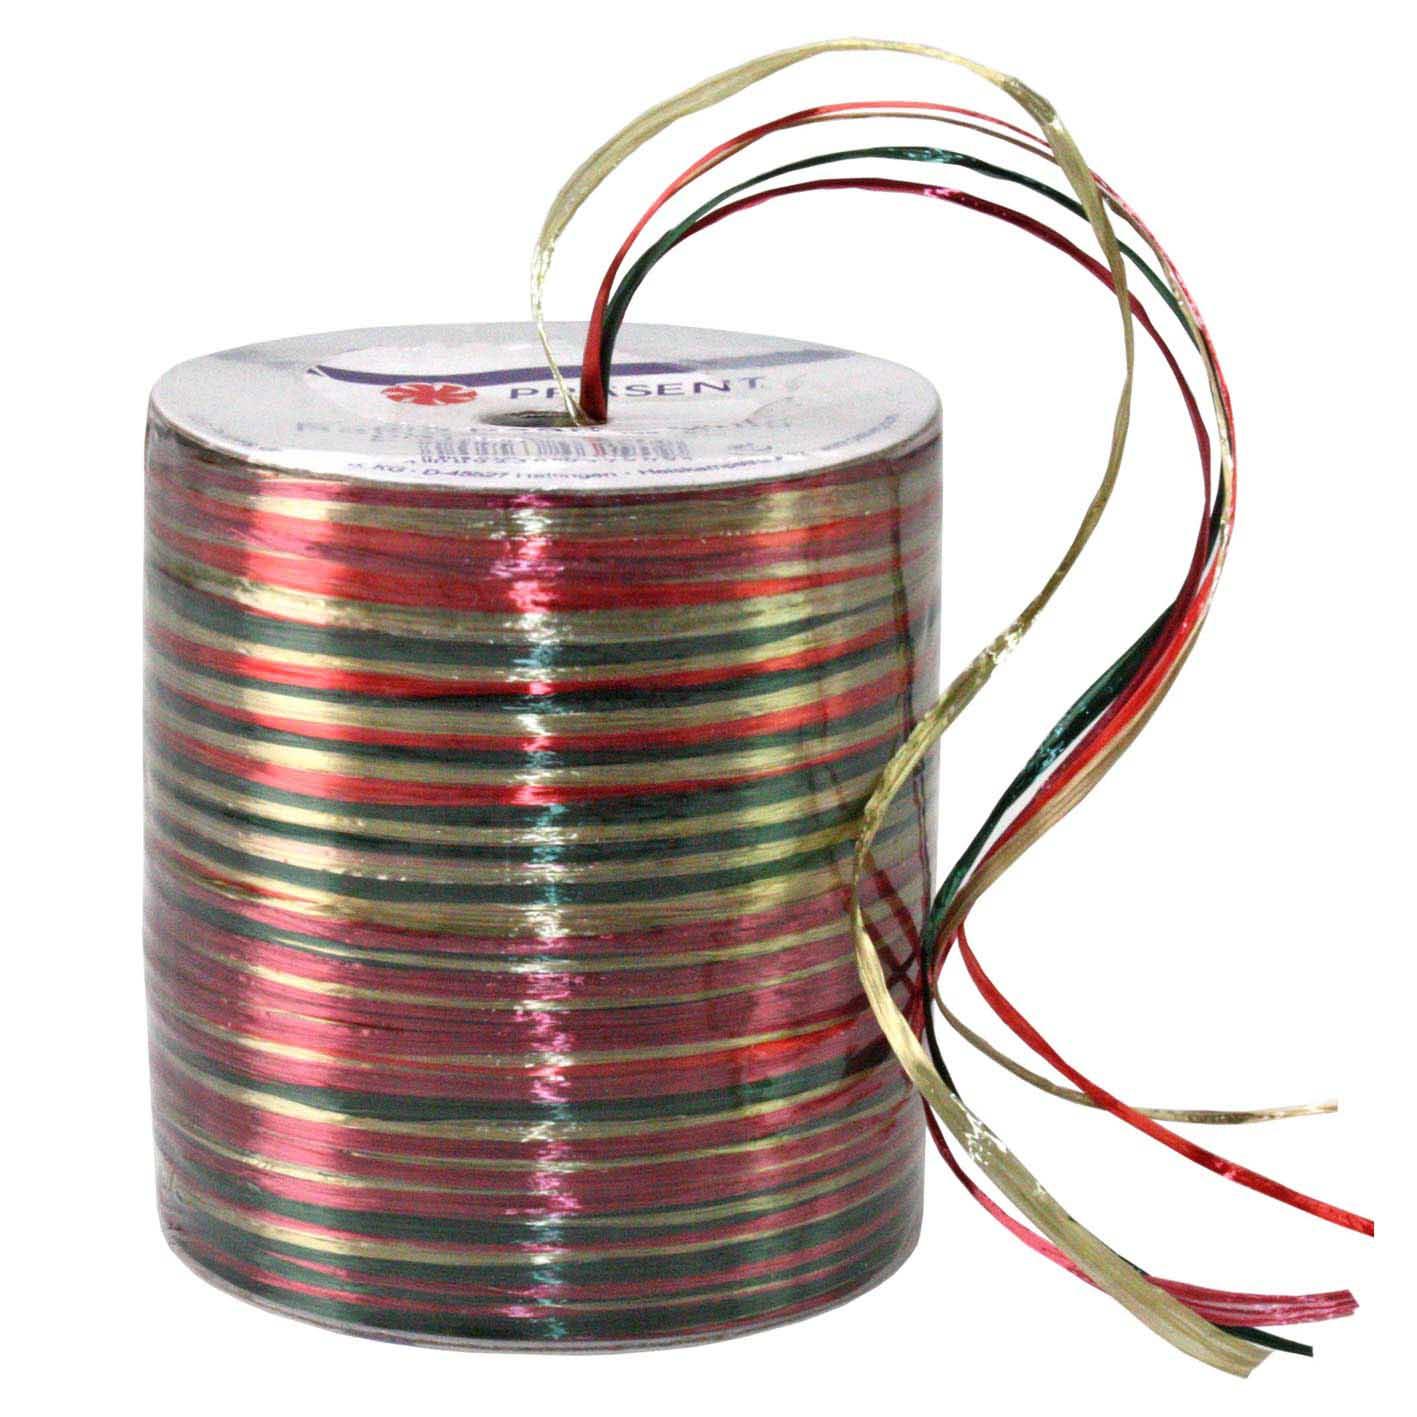 Bolduc raphia multicolore 5 couleurs - 50 m - bobine n°40 (photo)